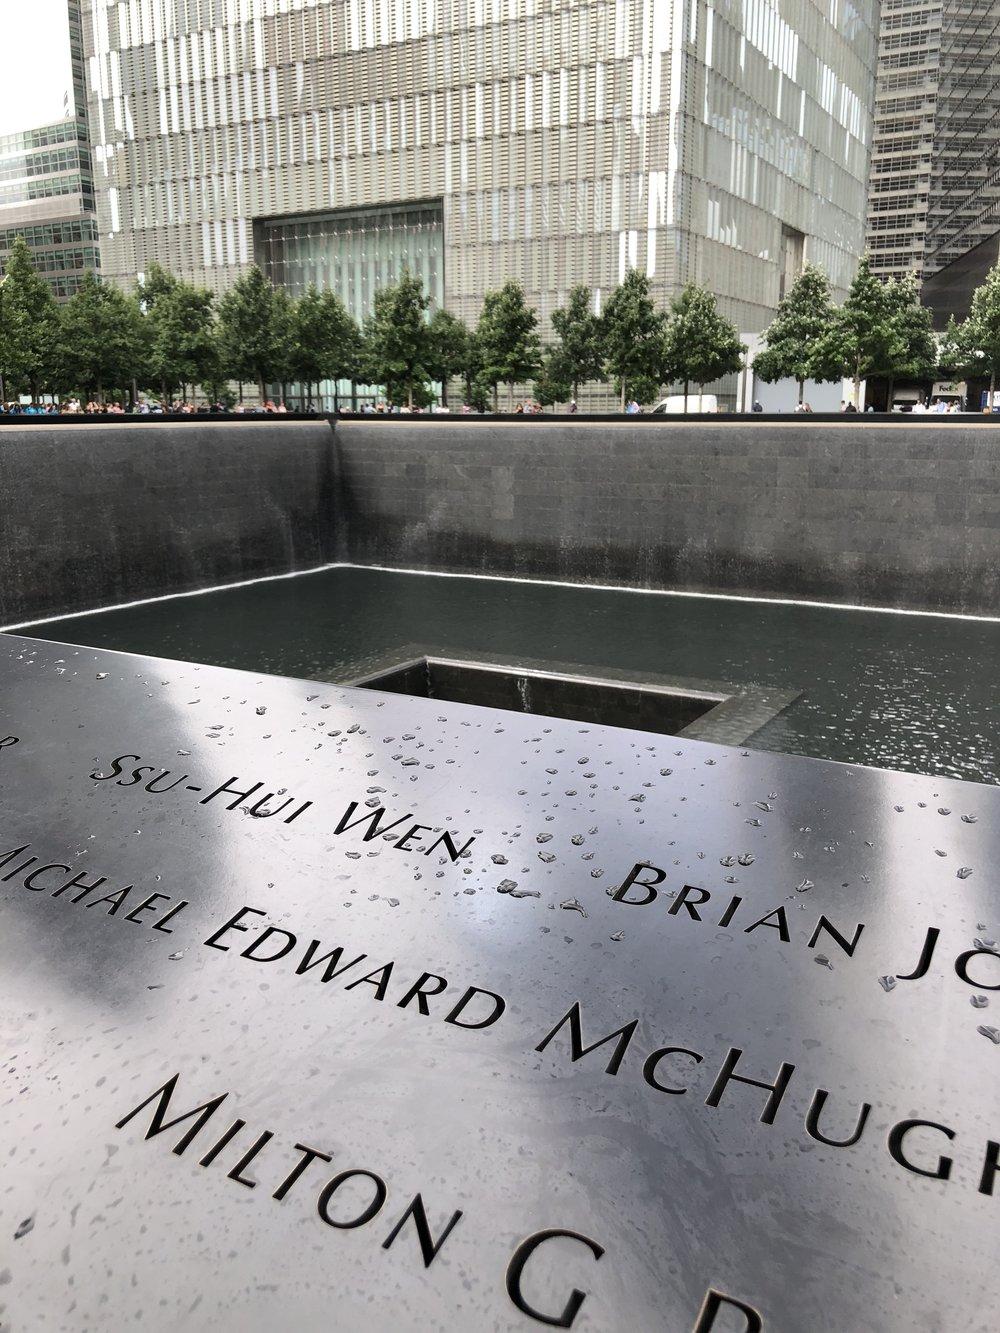 Image taken by Samantha McHenry, 9/11 Memorial, 2018.